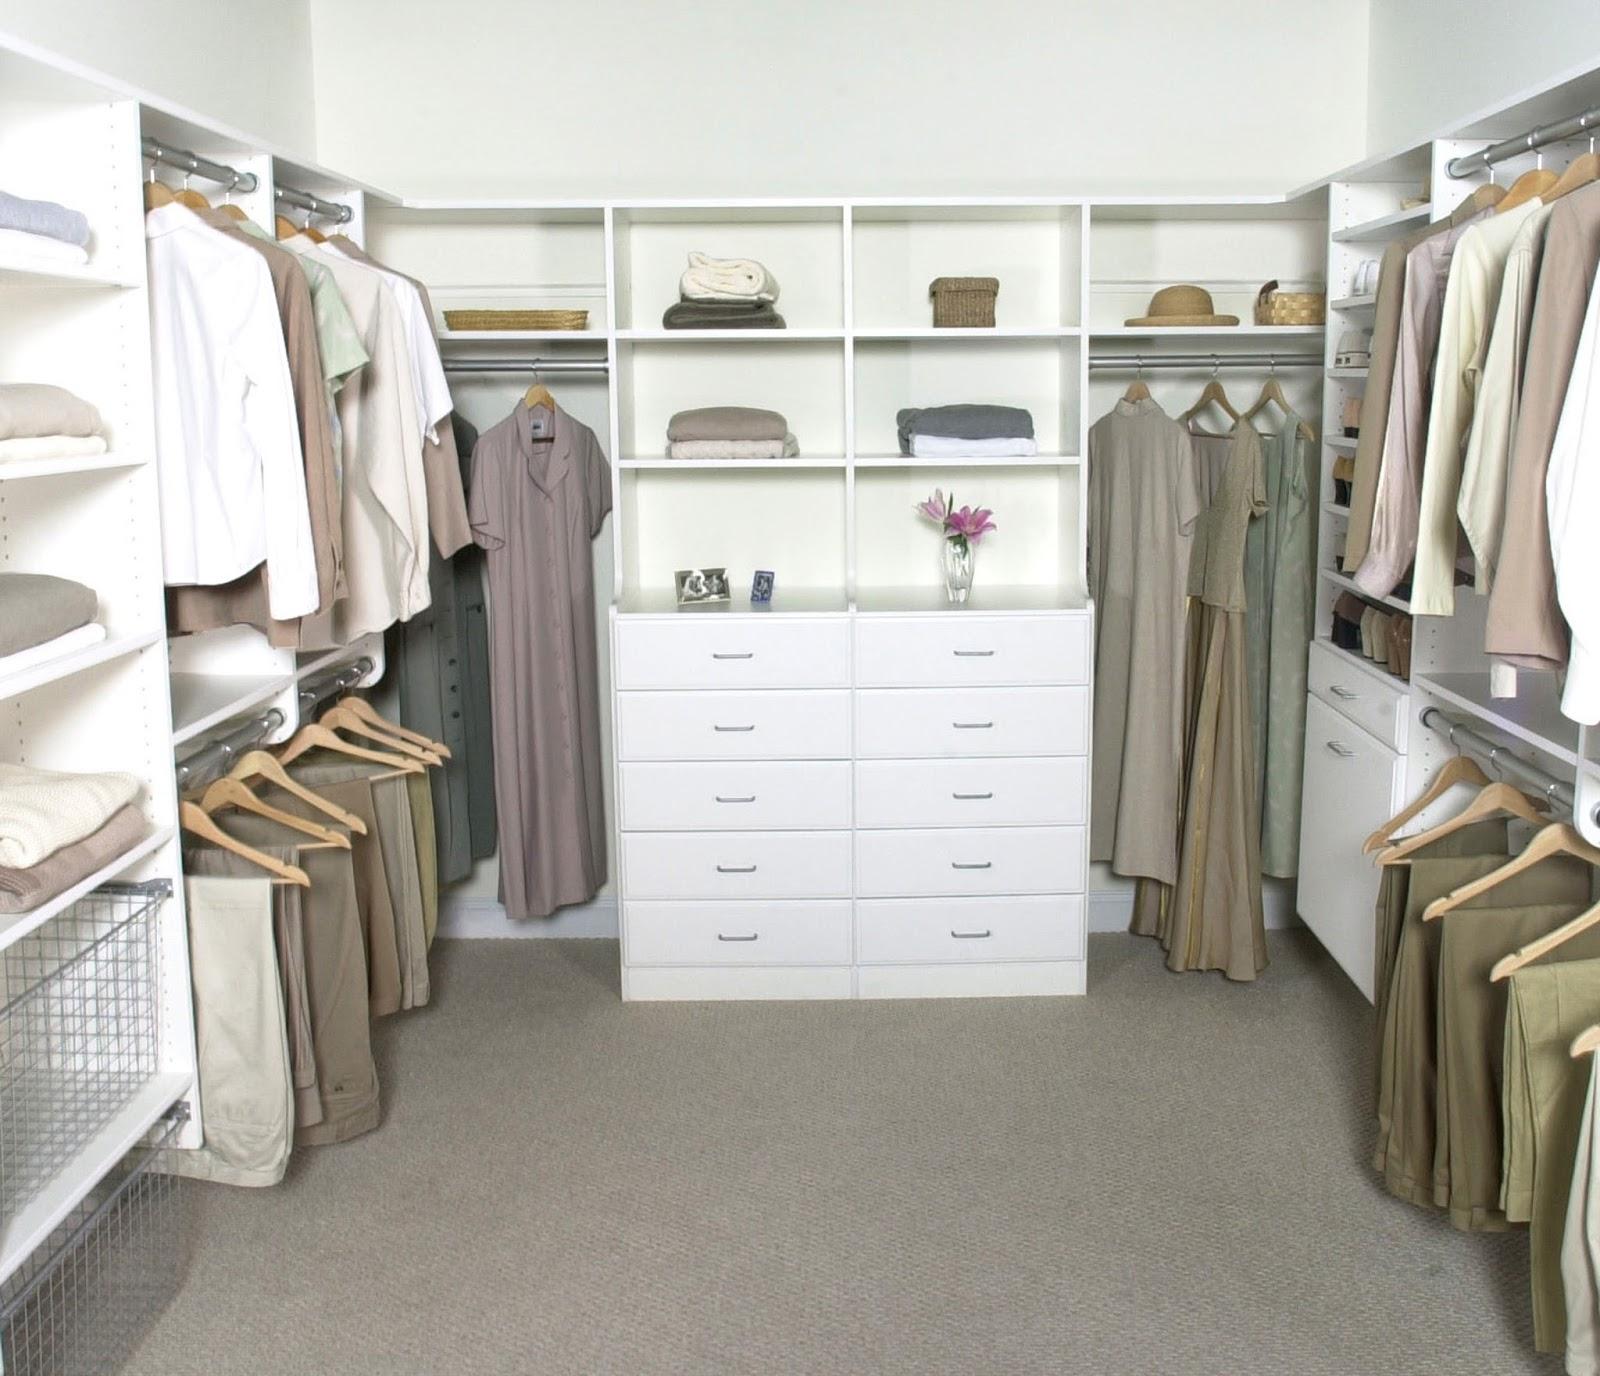 contemporary closet designers raleigh nc roselawnlutheran raleigh nc home u0026 decor great ikea walk in closet design decorating ideas for men with ikea design